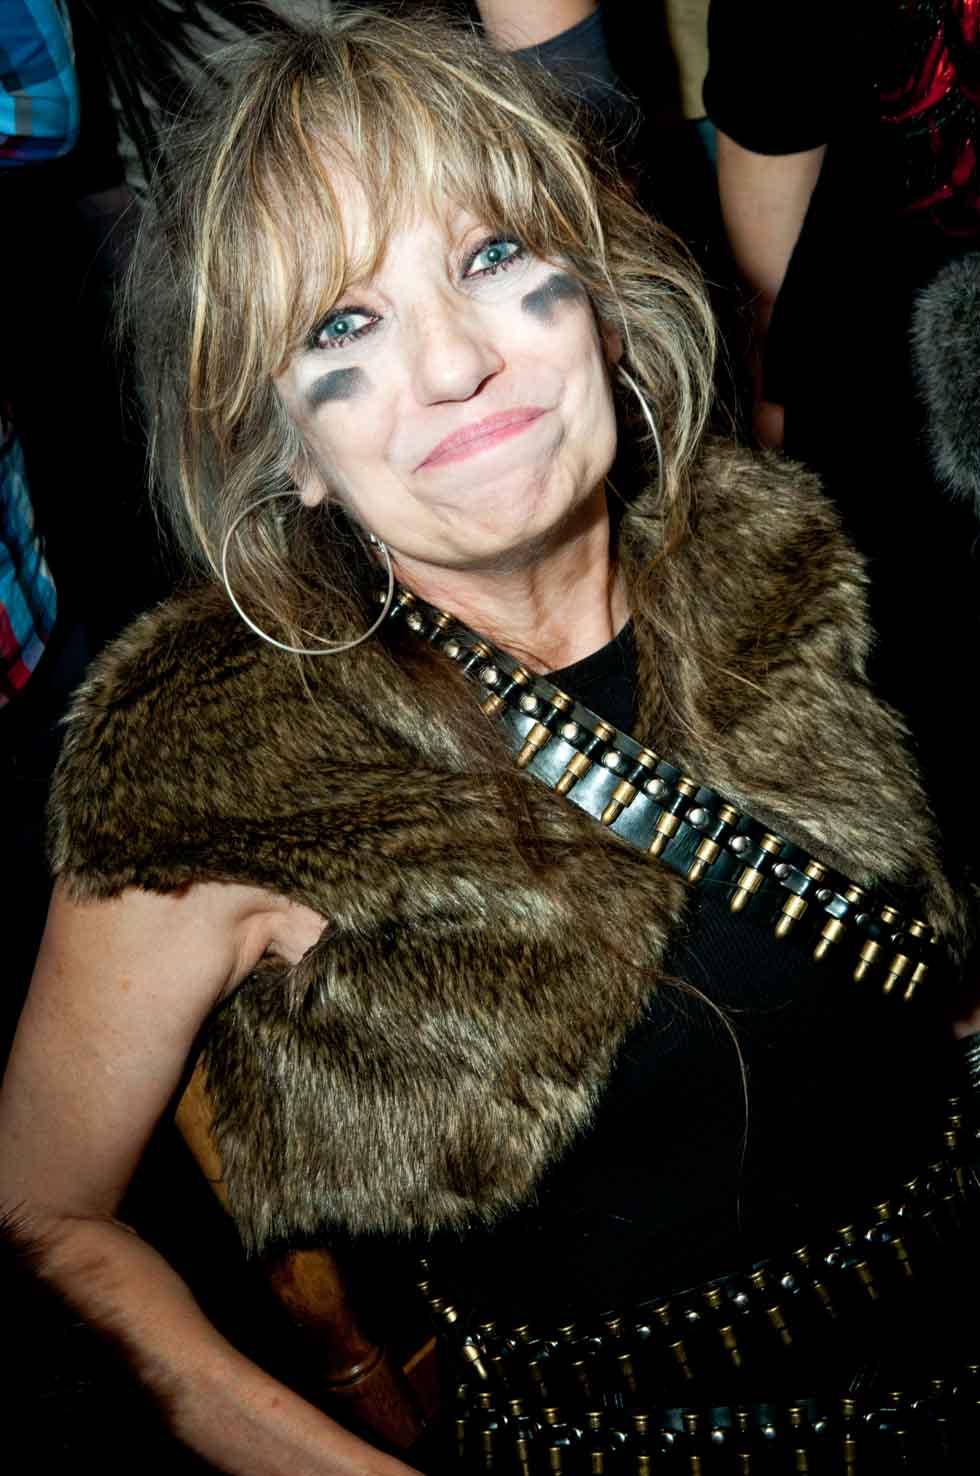 zum-schneider-nyc-2012-karneval-apocalyptika-3483.jpg